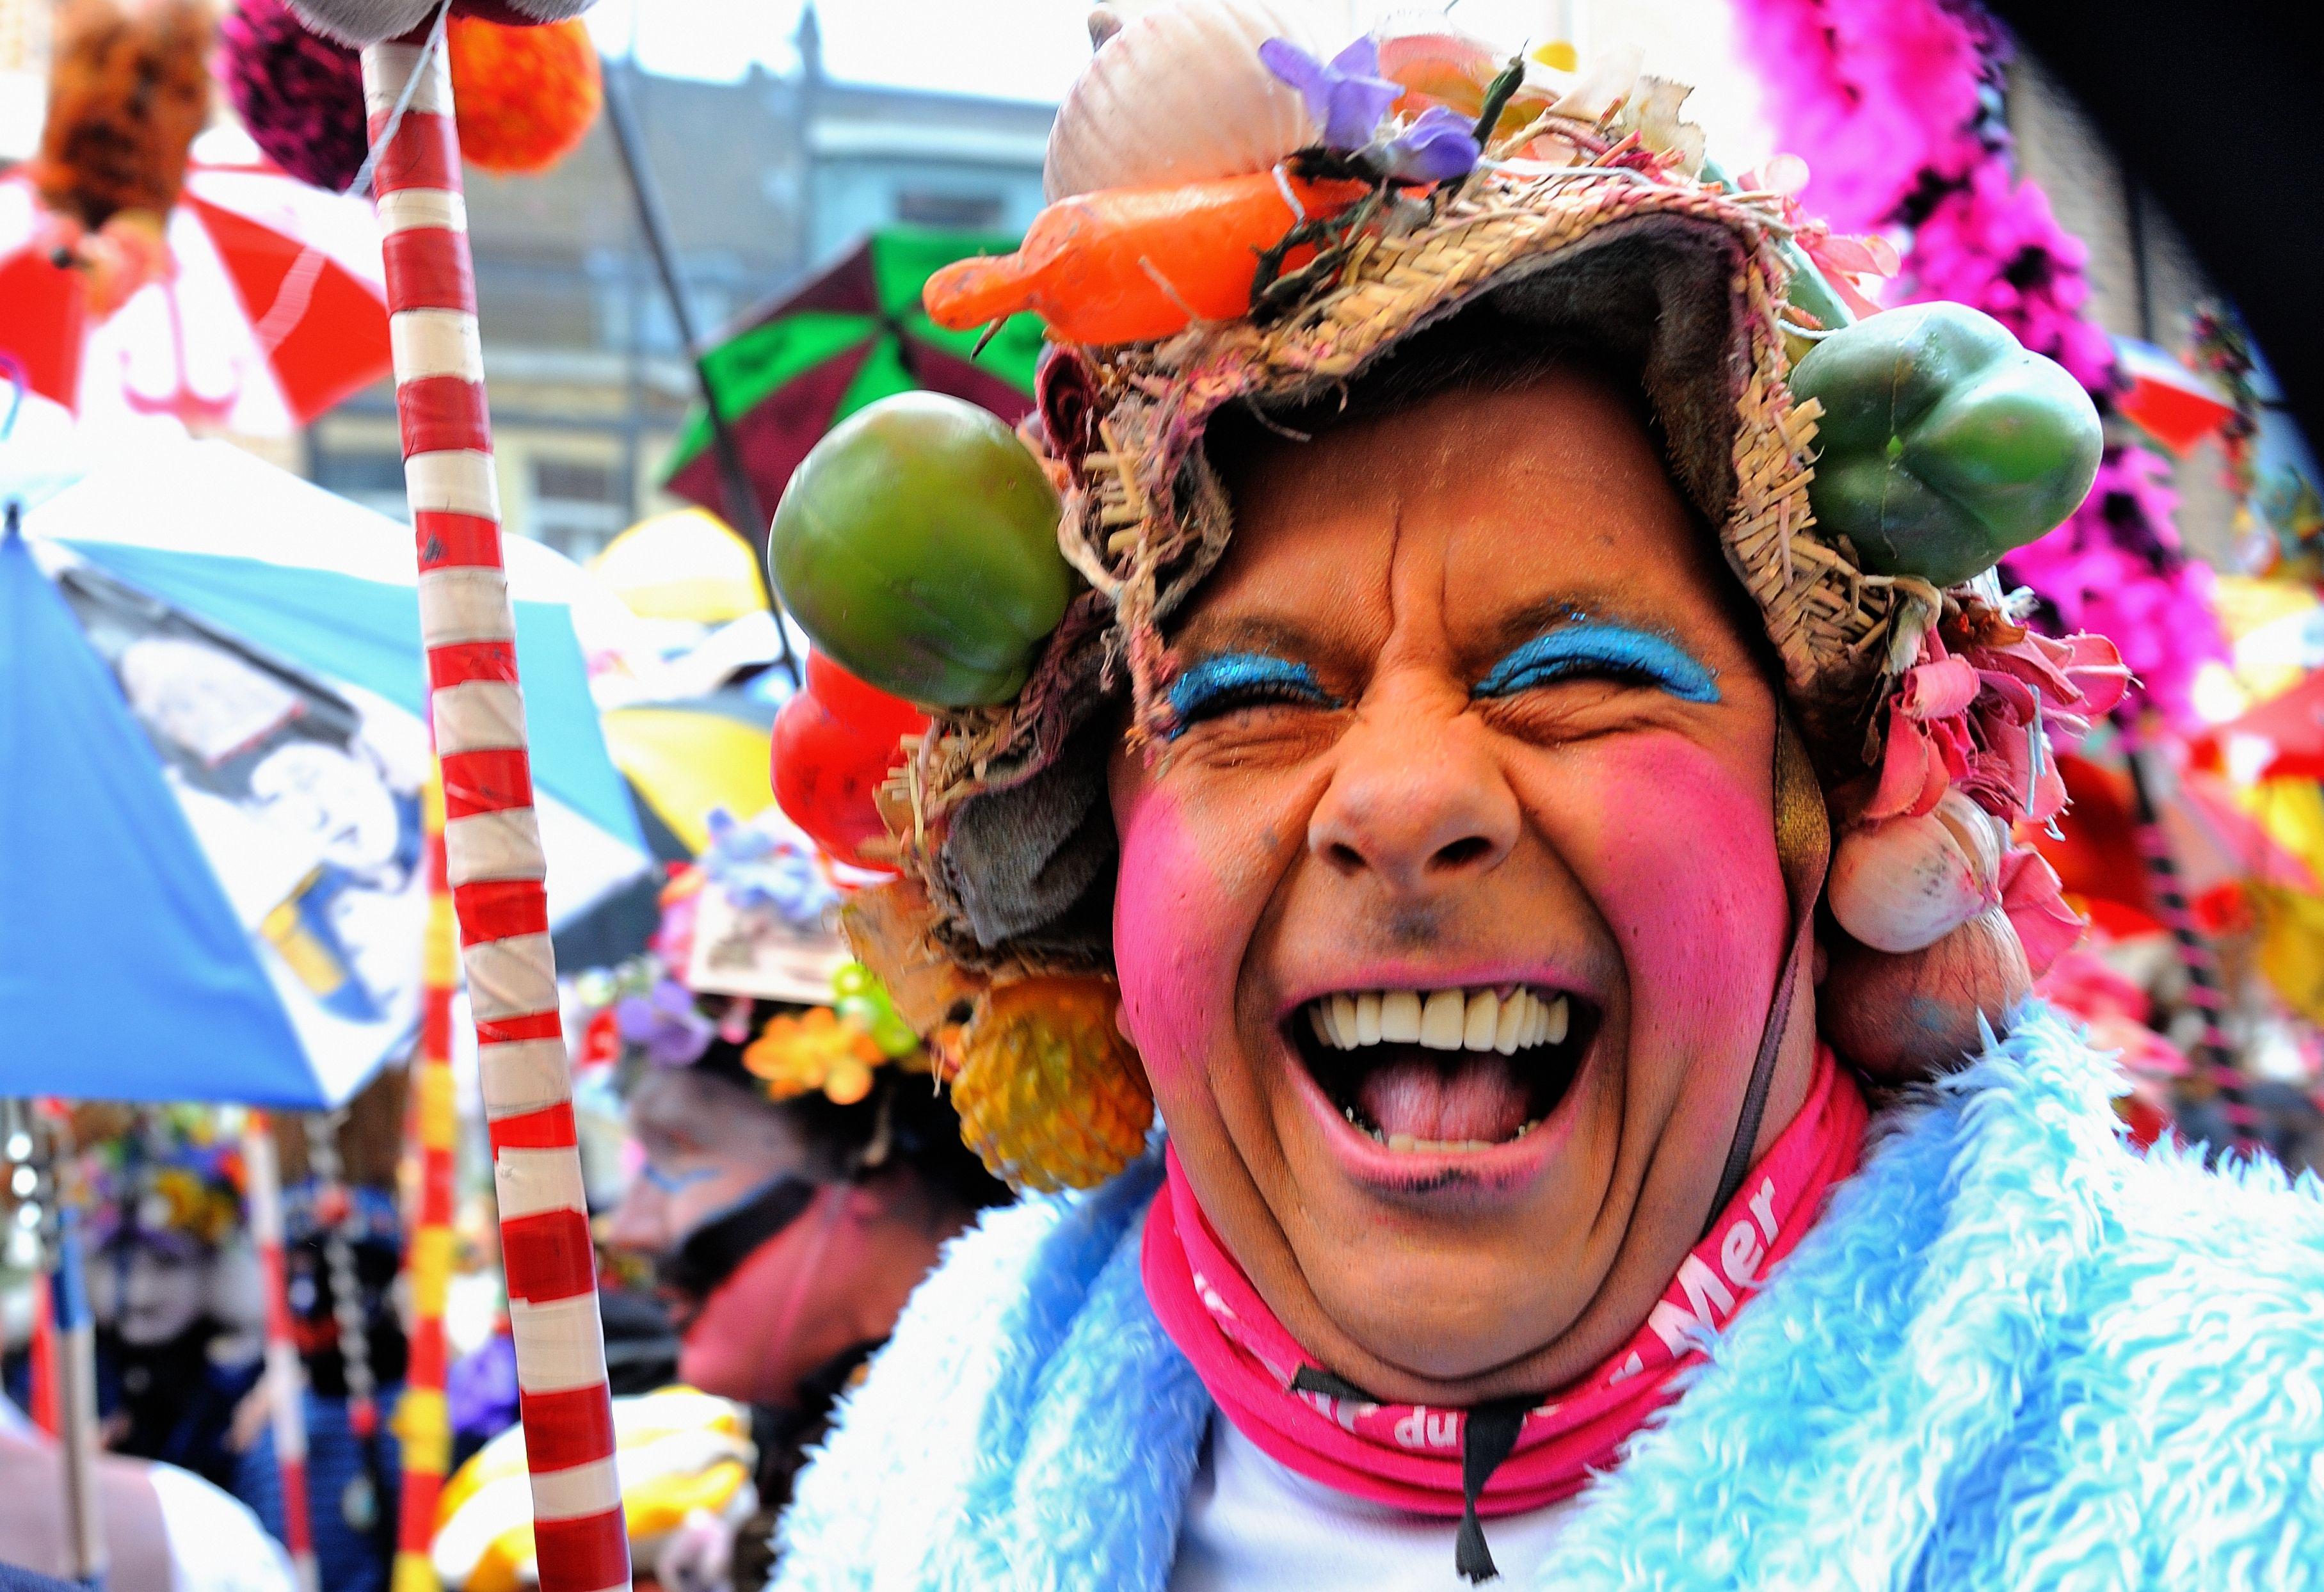 Carnavalier au Carnaval de Dunkerque, en France